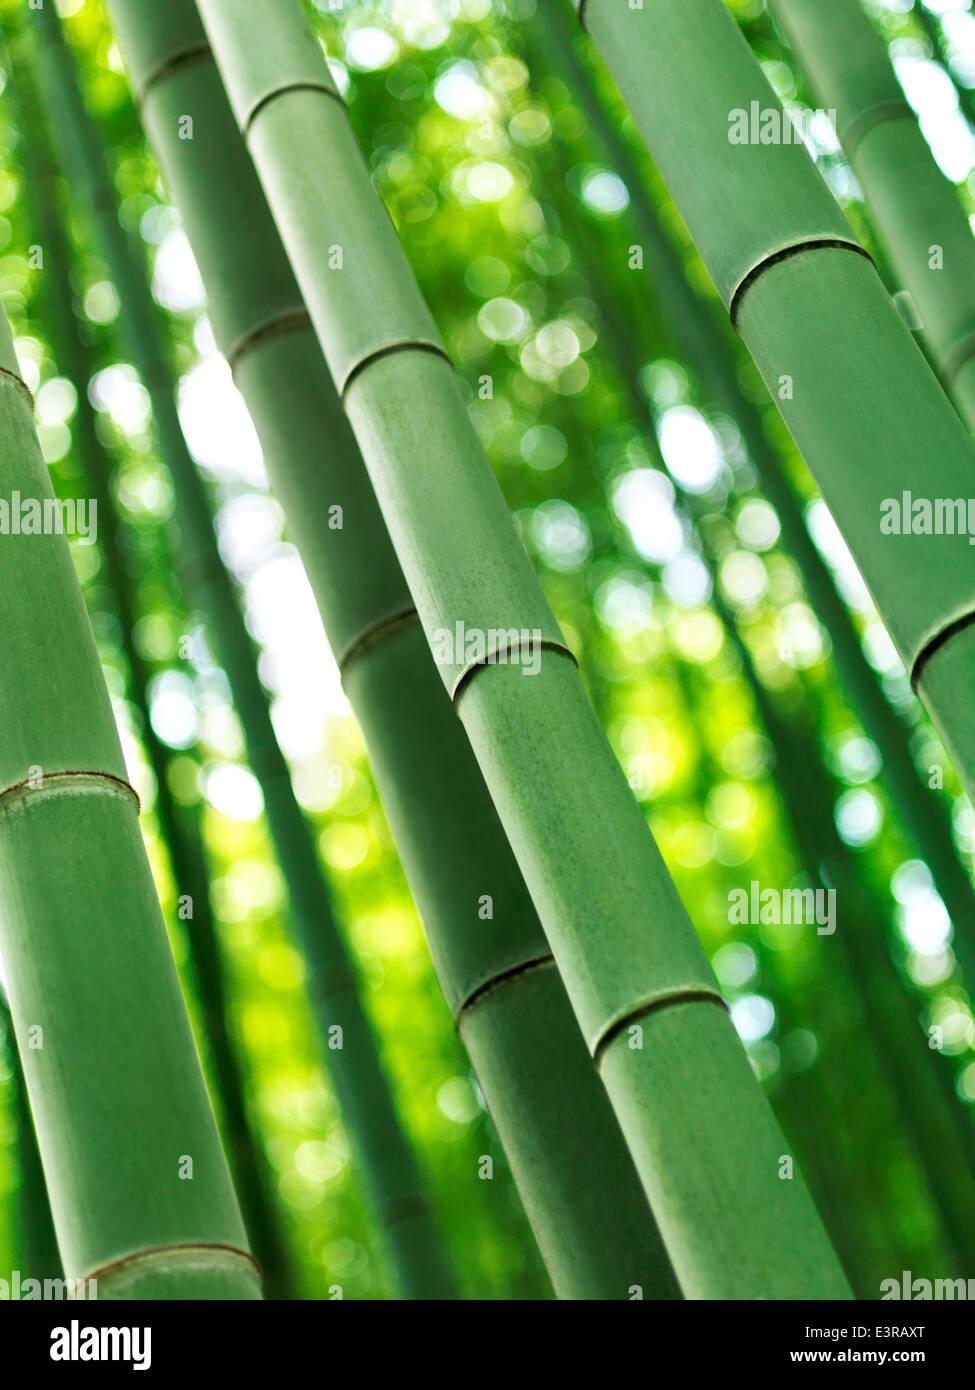 Bamboo forest closeup of stems at Arashiyama bamboo forest, Kyoto, Japan. - Stock Image